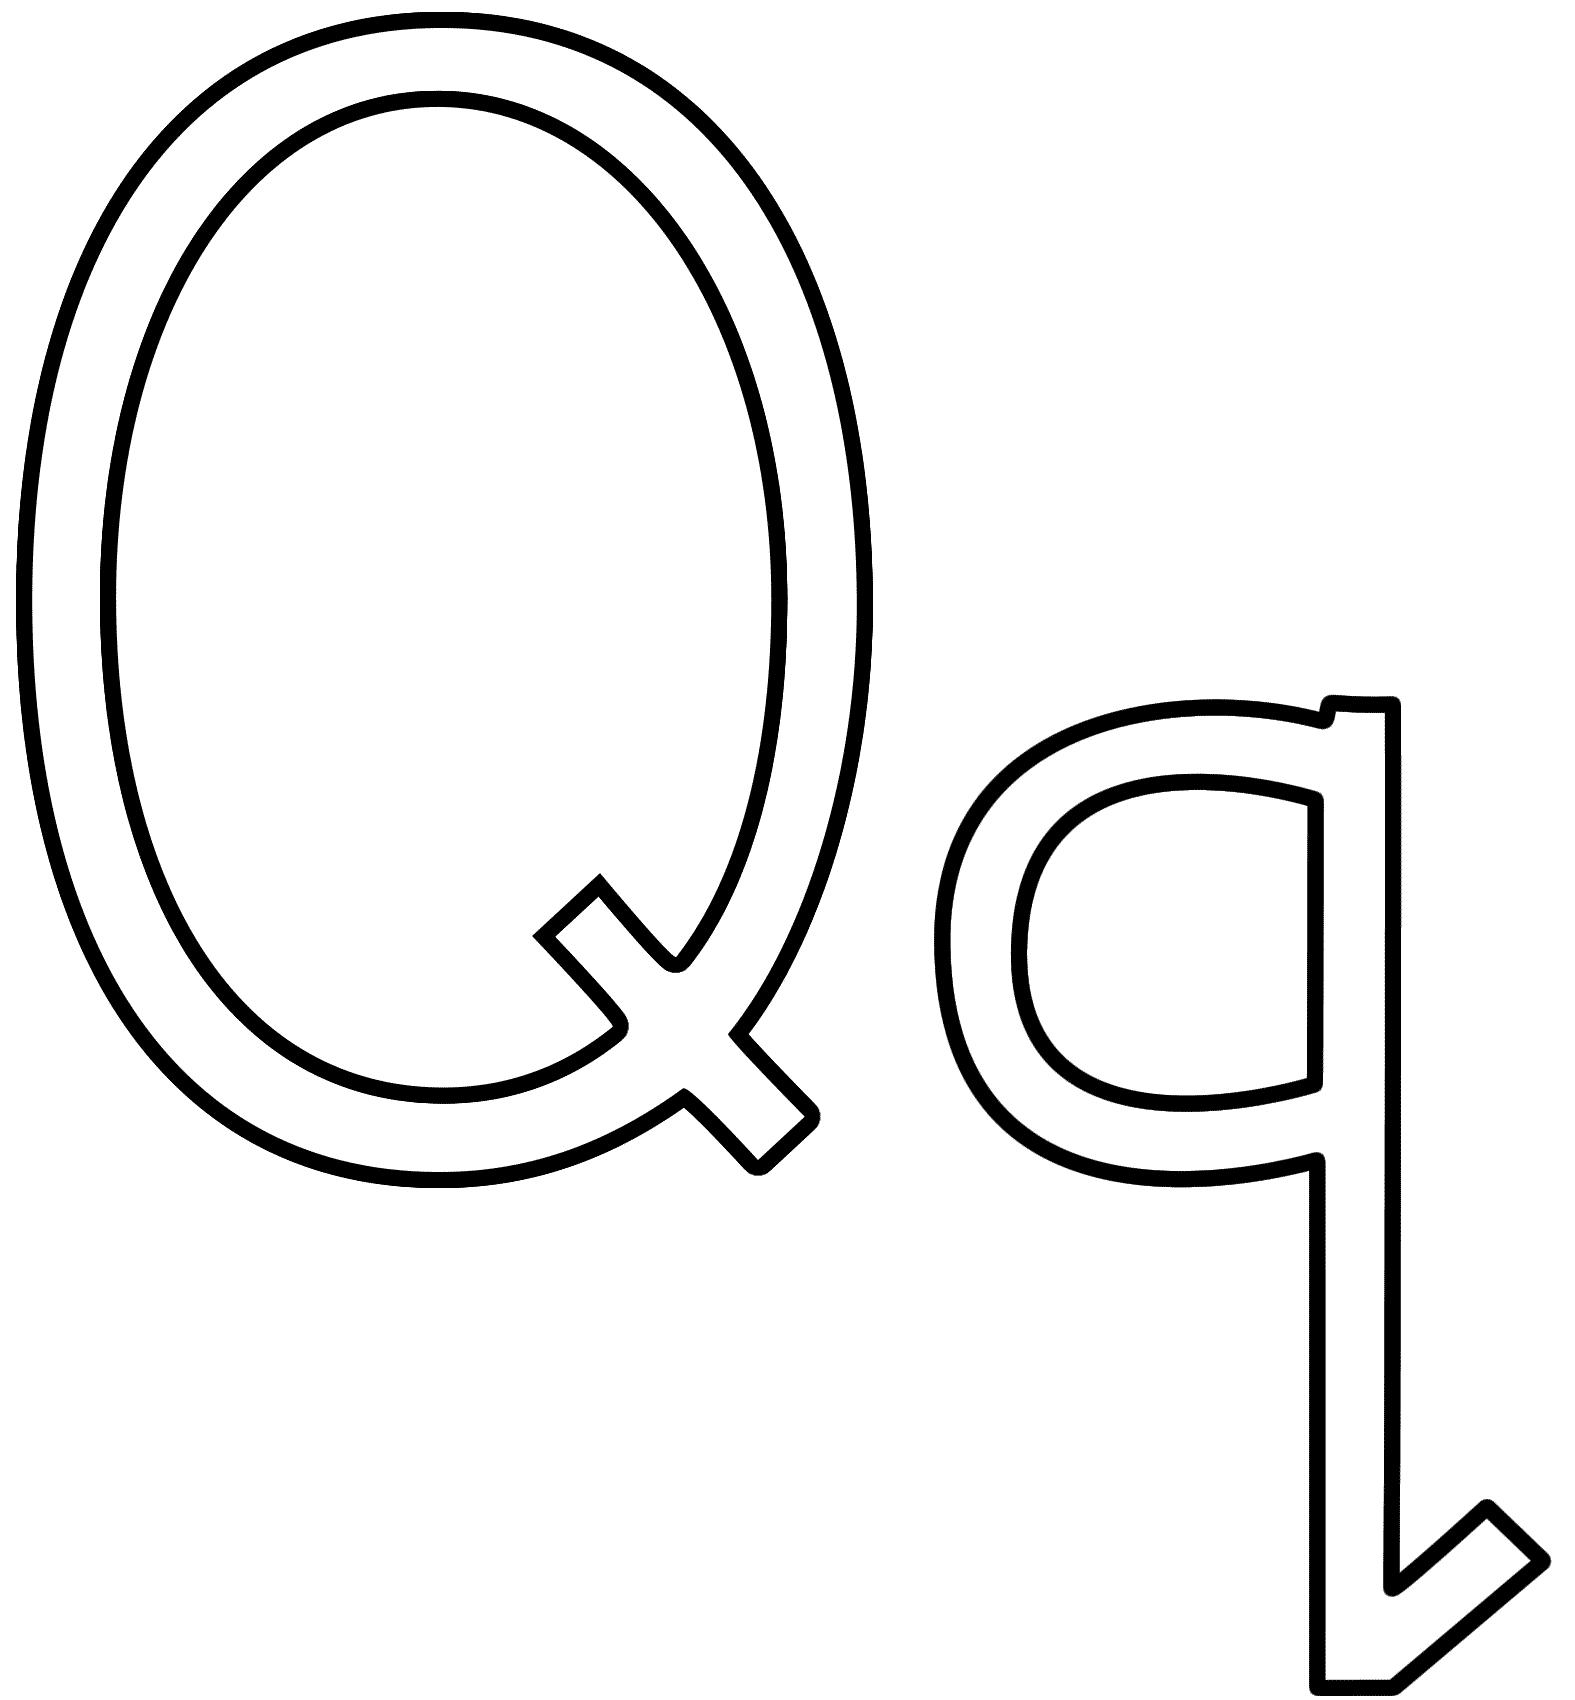 Coloring Pages Letter Q